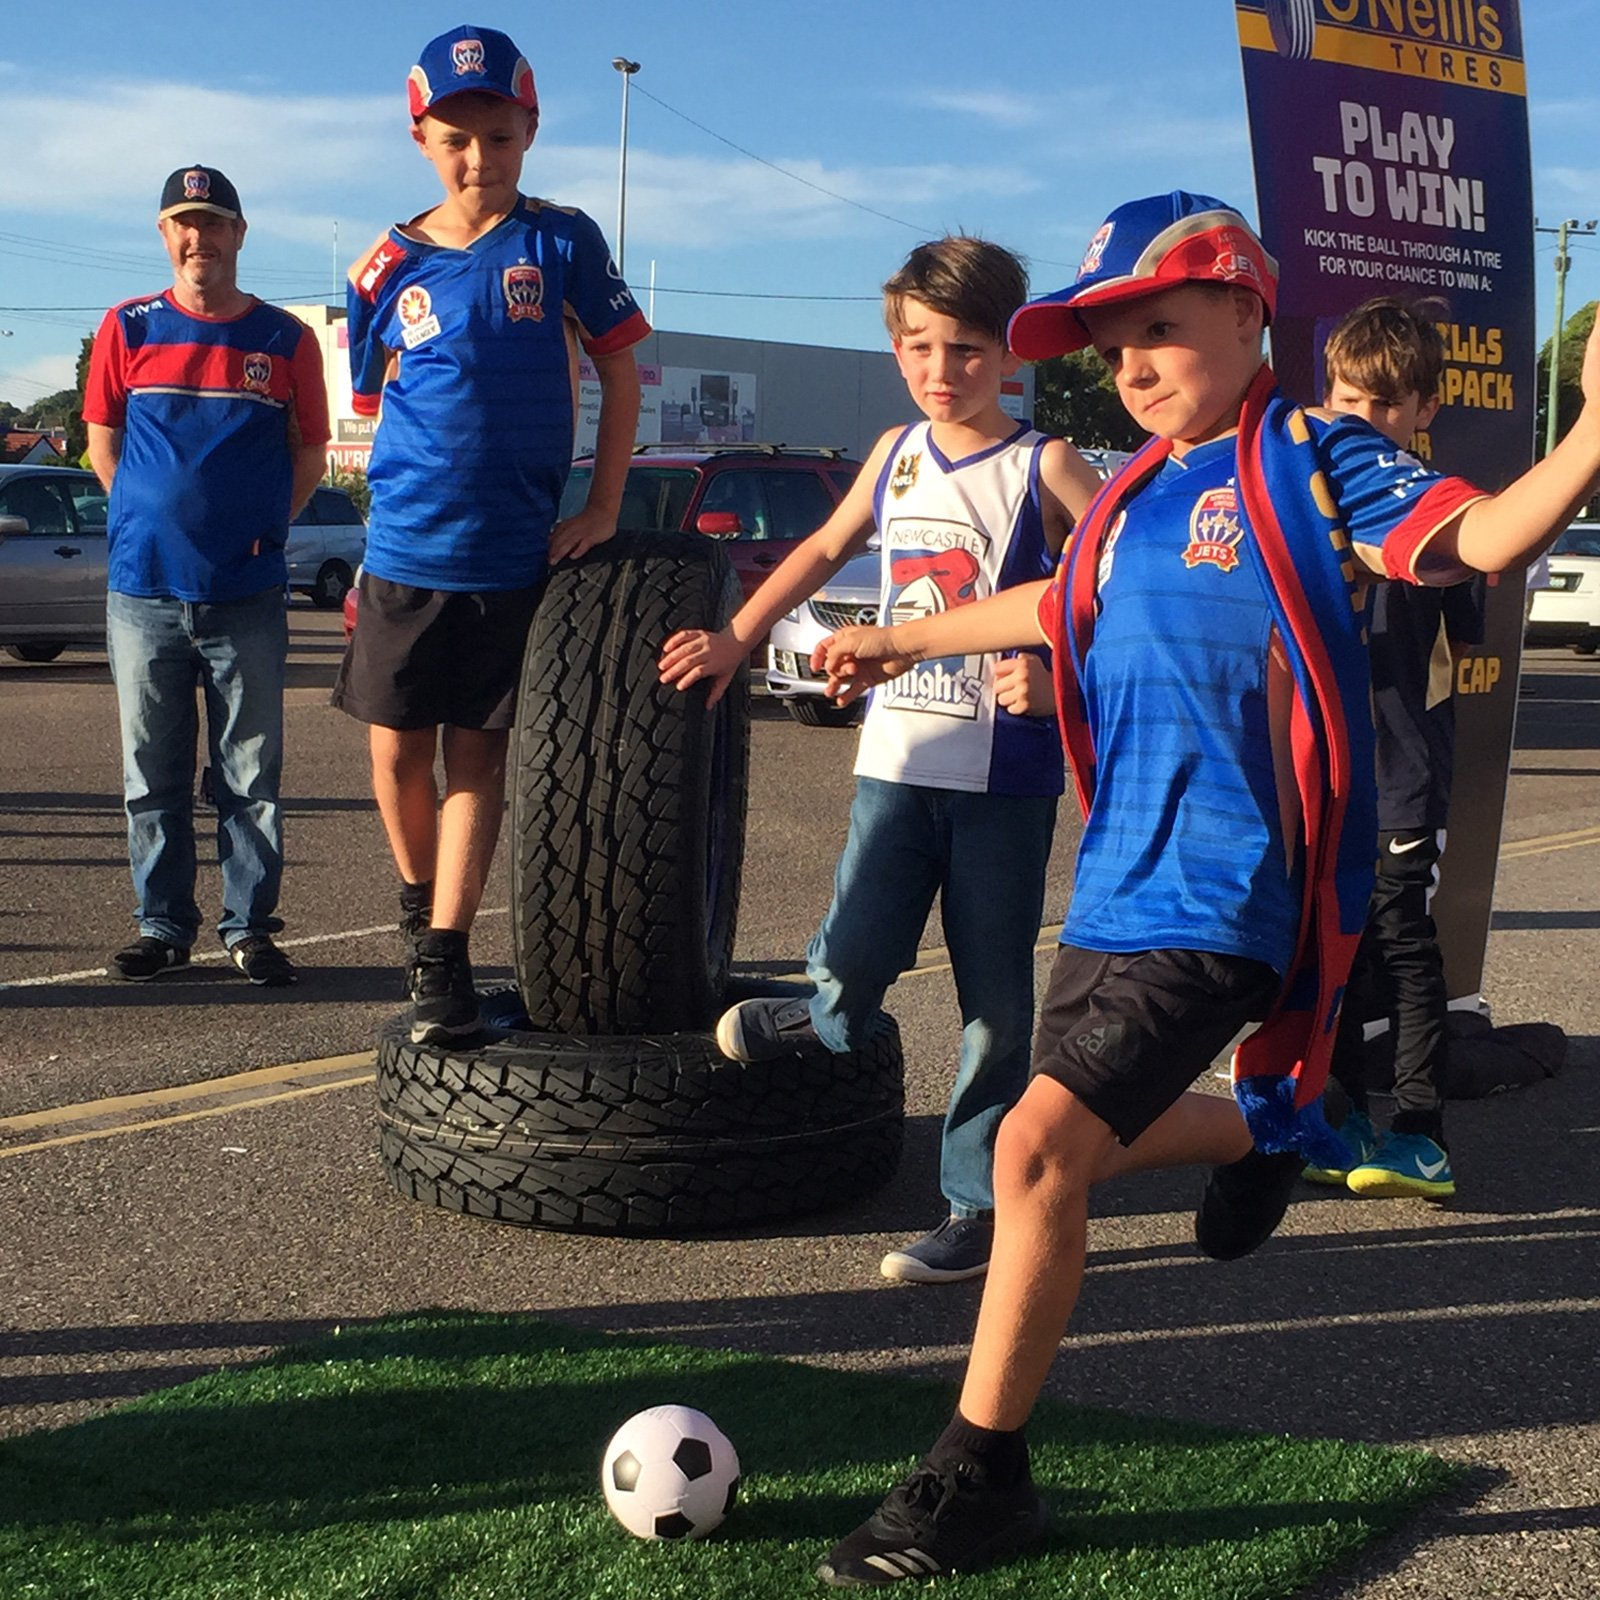 O'Neill's Tyres Event